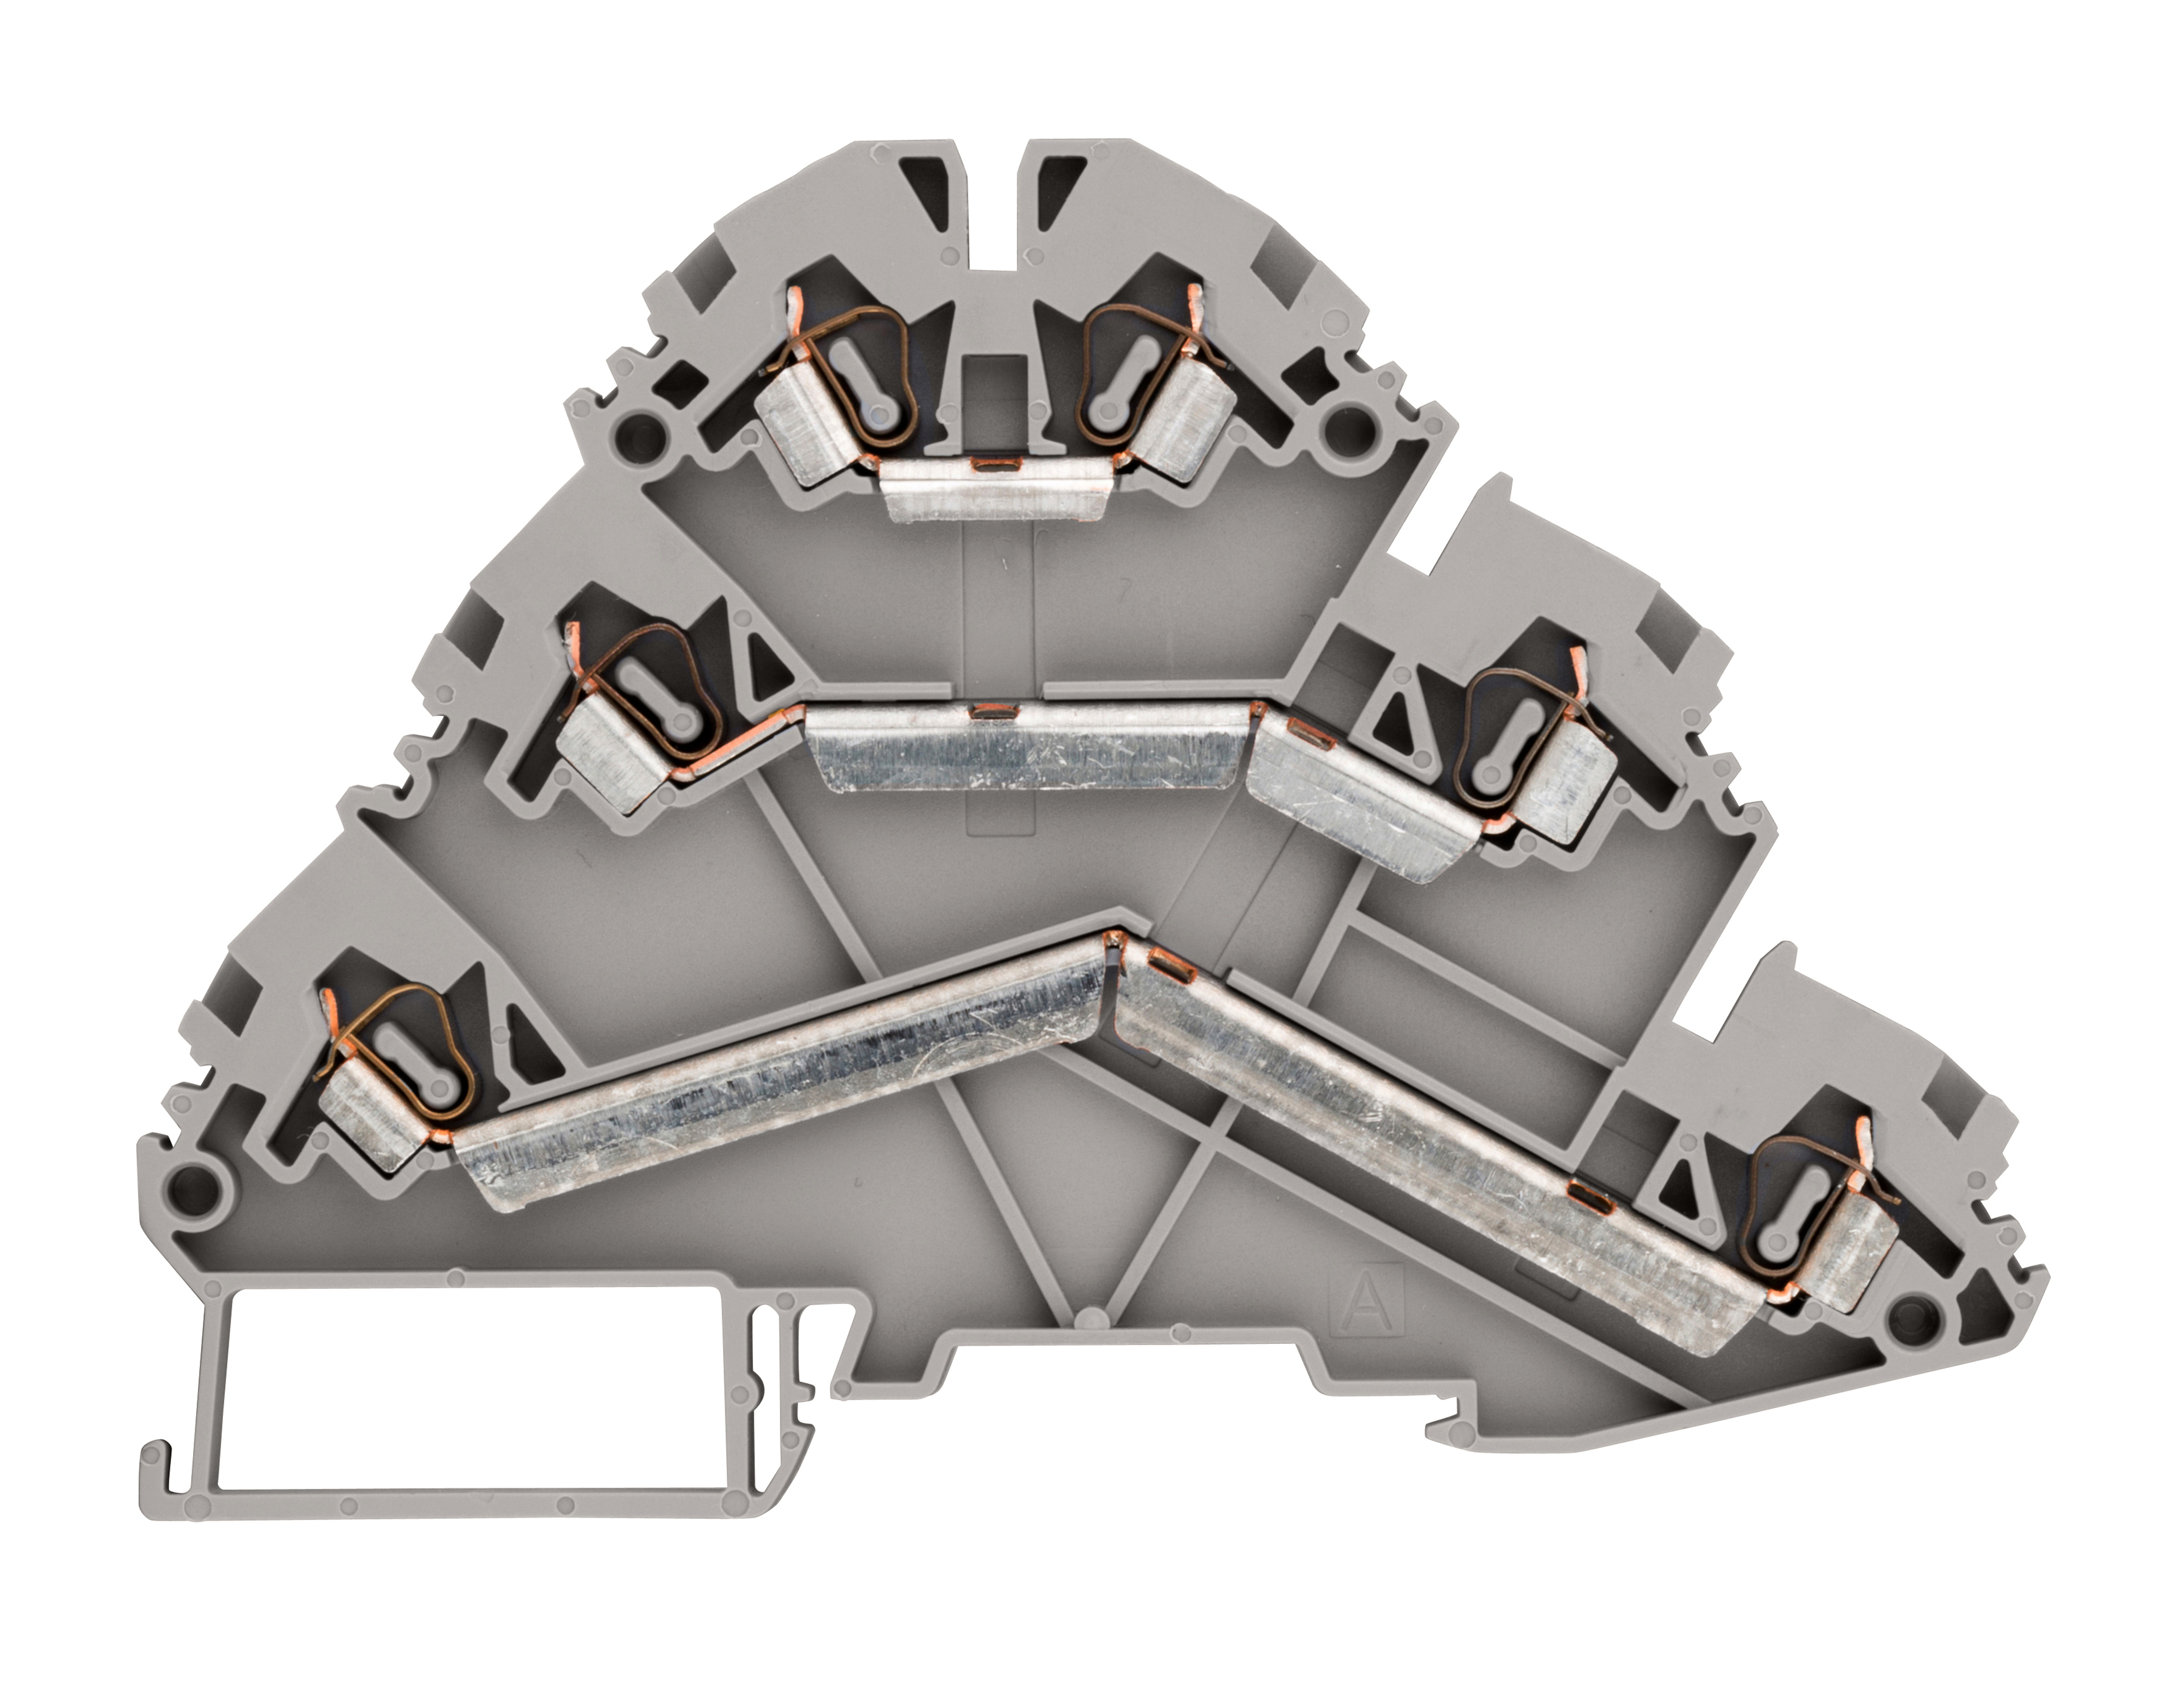 1 Stk Federkraft-Dreistockklemme 2,5mm², Type YBK 2,5 3F, grau IK690001--